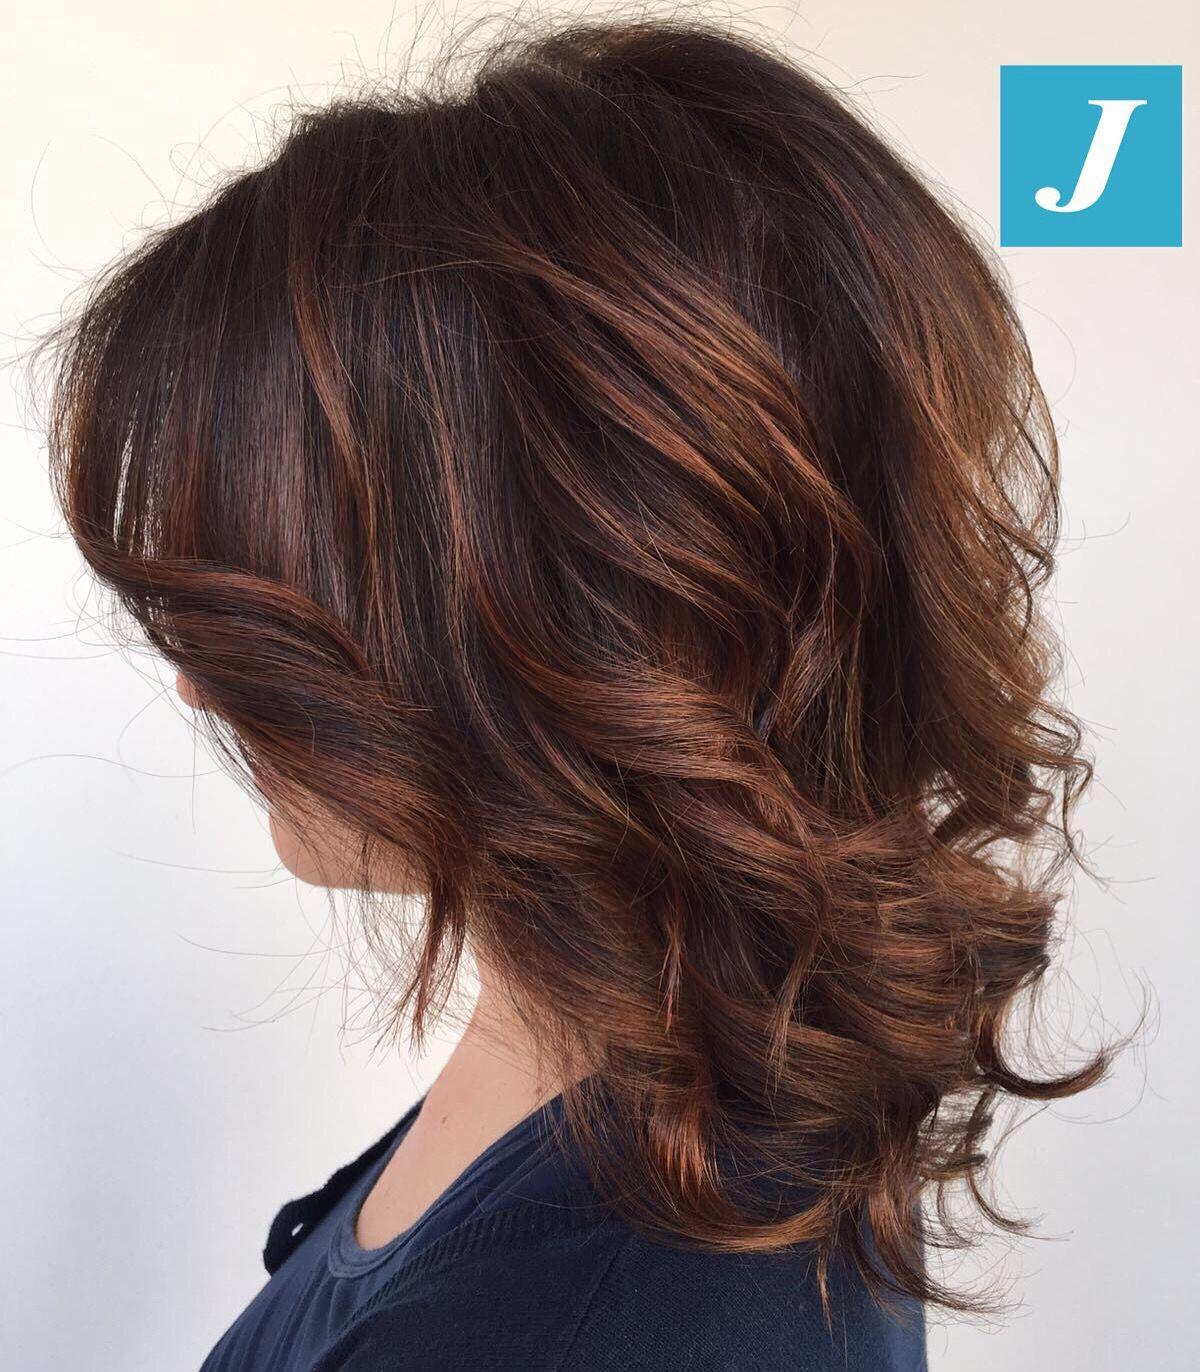 Coffee Shades e Taglio Punte Aria #cdj #degradejoelle #tagliopuntearia #degradé #igers #musthave #hair #hairstyle #haircolour #longhair #ootd #hairfashion #madeinitaly